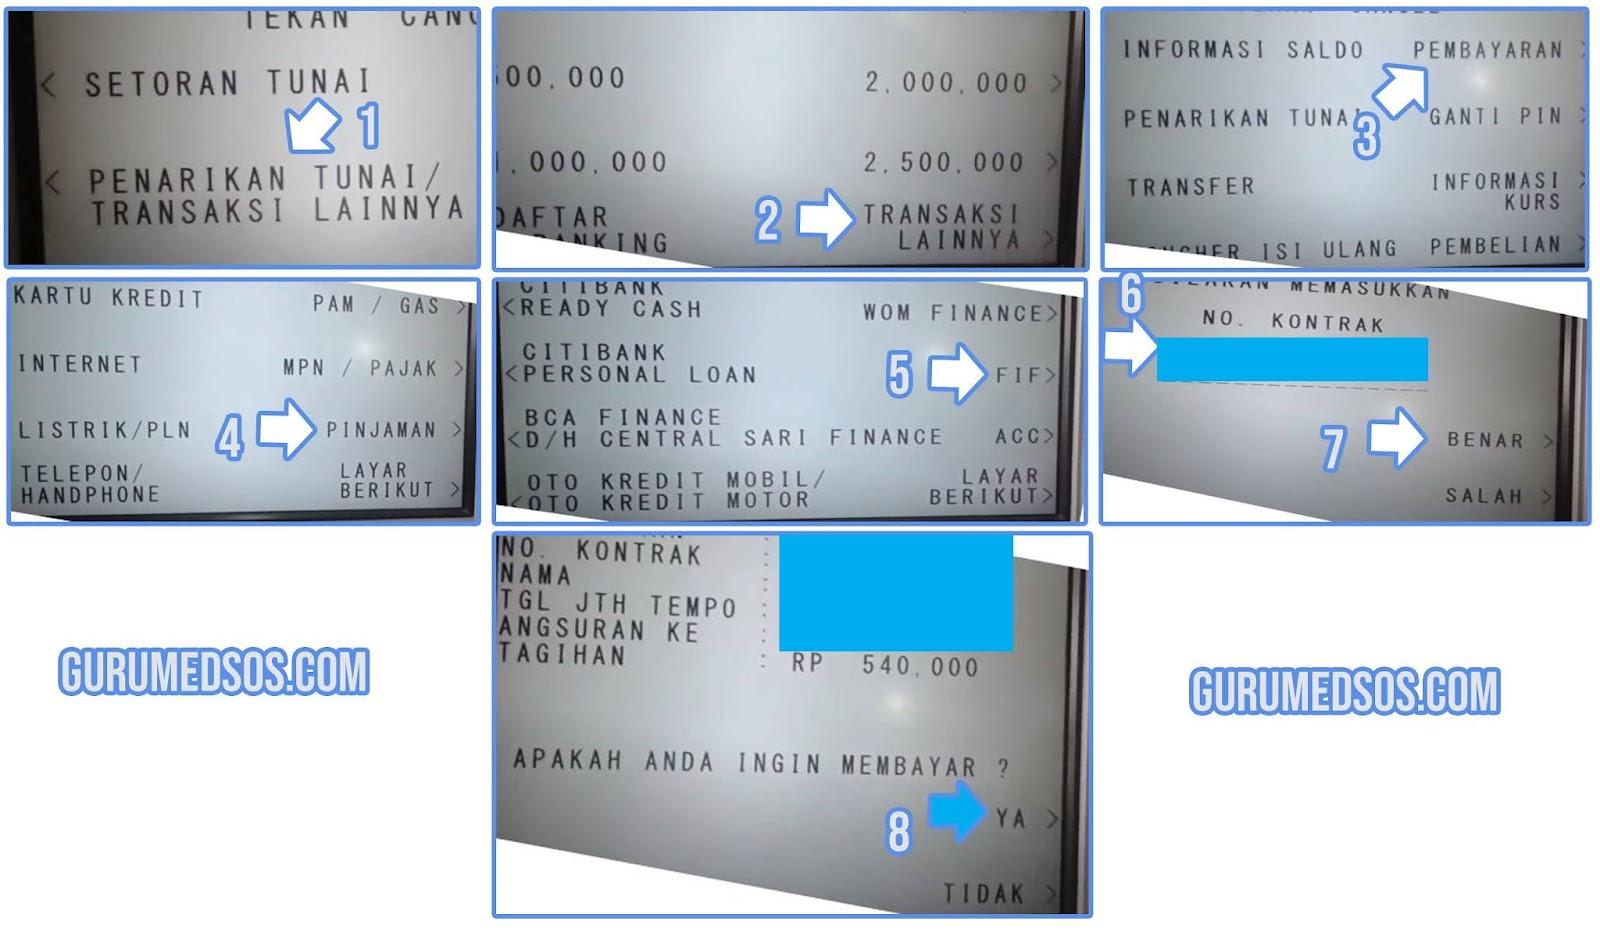 Cara Bayar FIF Lewat ATM BCA